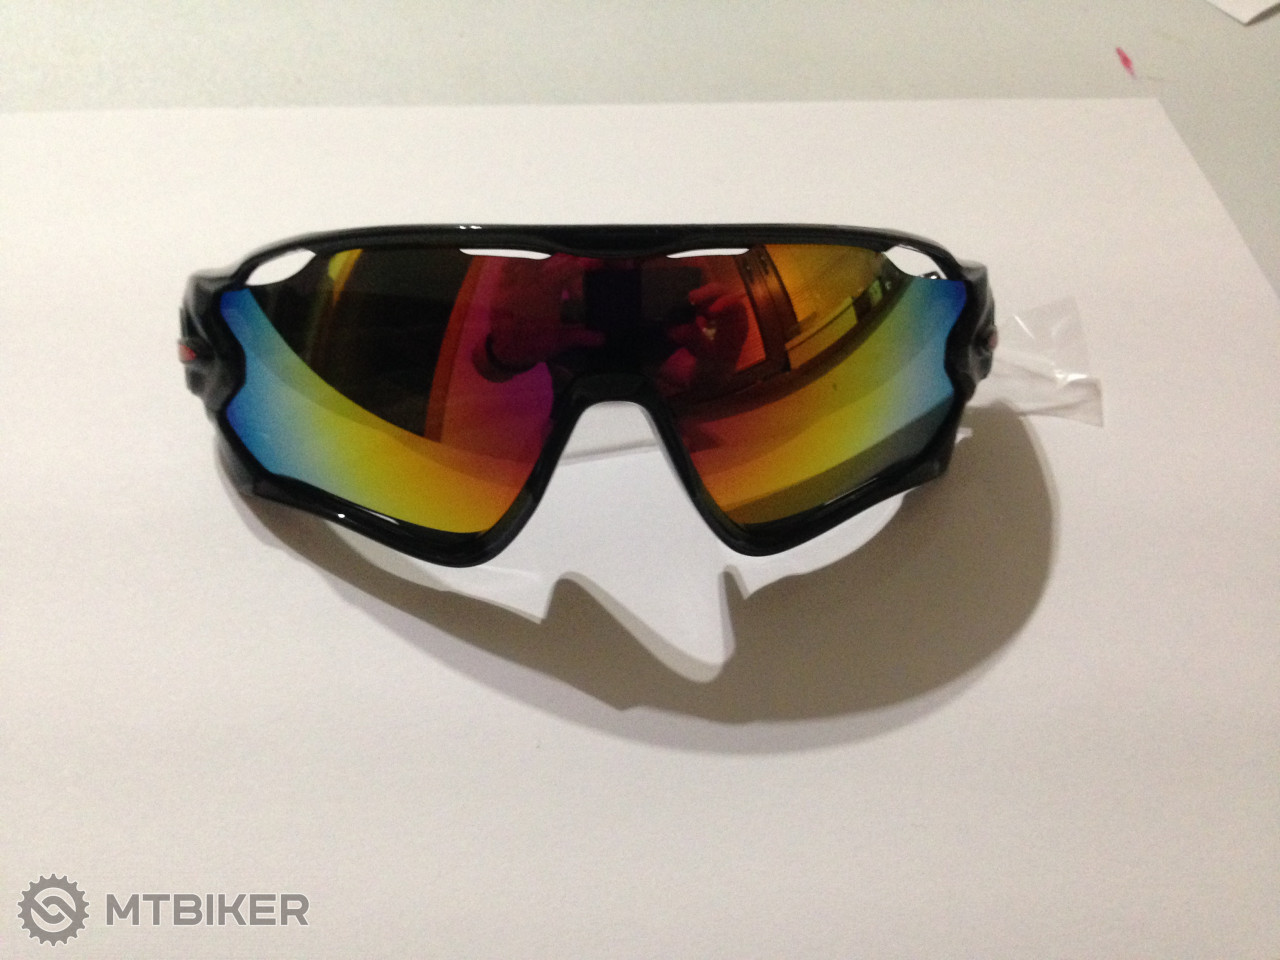 6d12d7117 Replika Oakley - Príslušenstvo - Okuliare - Bazár MTBIKER